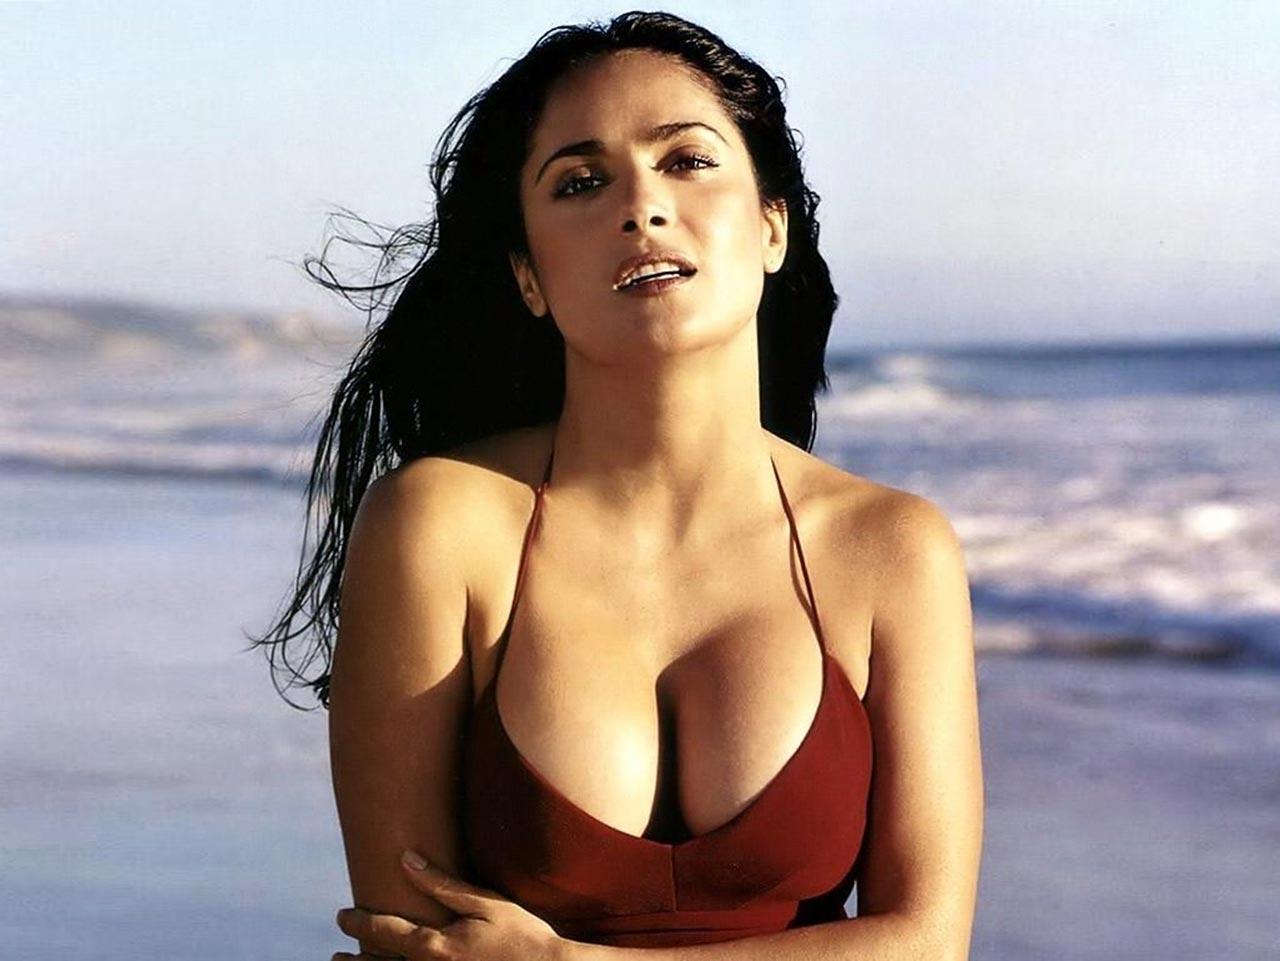 Nude scenes of actresses